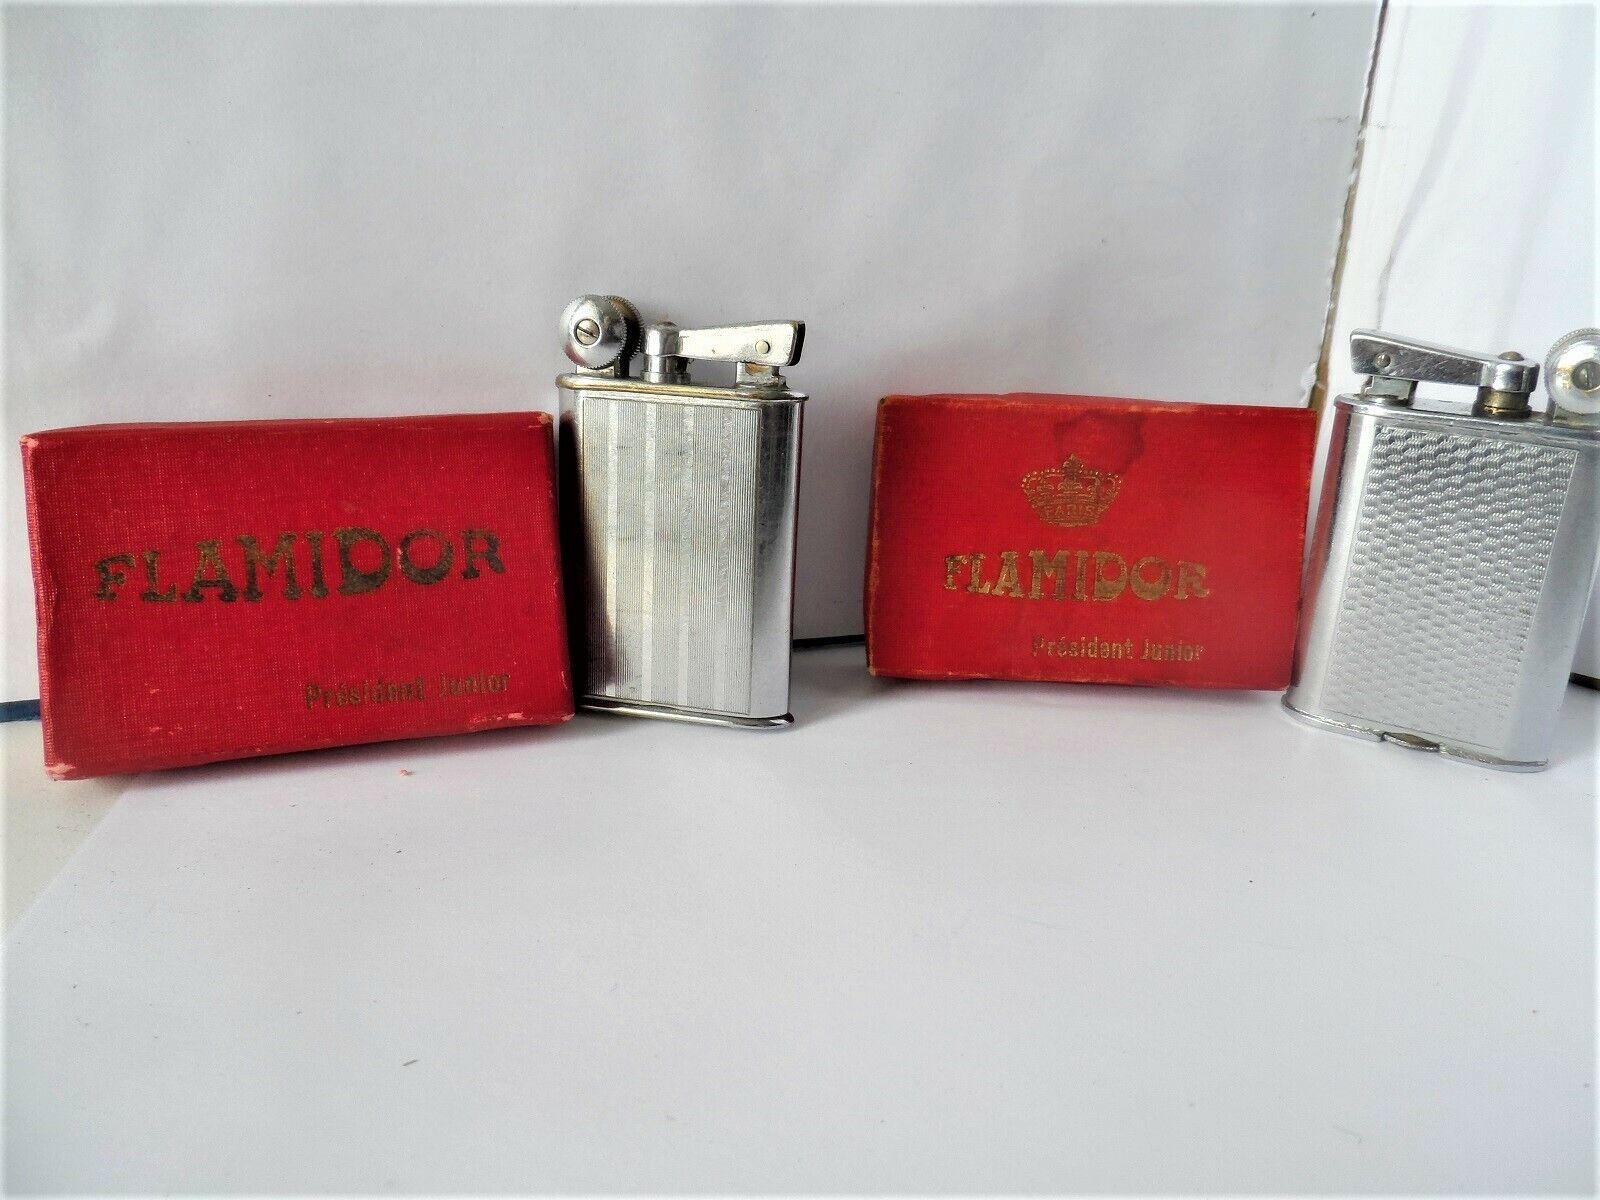 2 briquets essence flamidor présidant - junior - vintage-lighter - feueurgeug